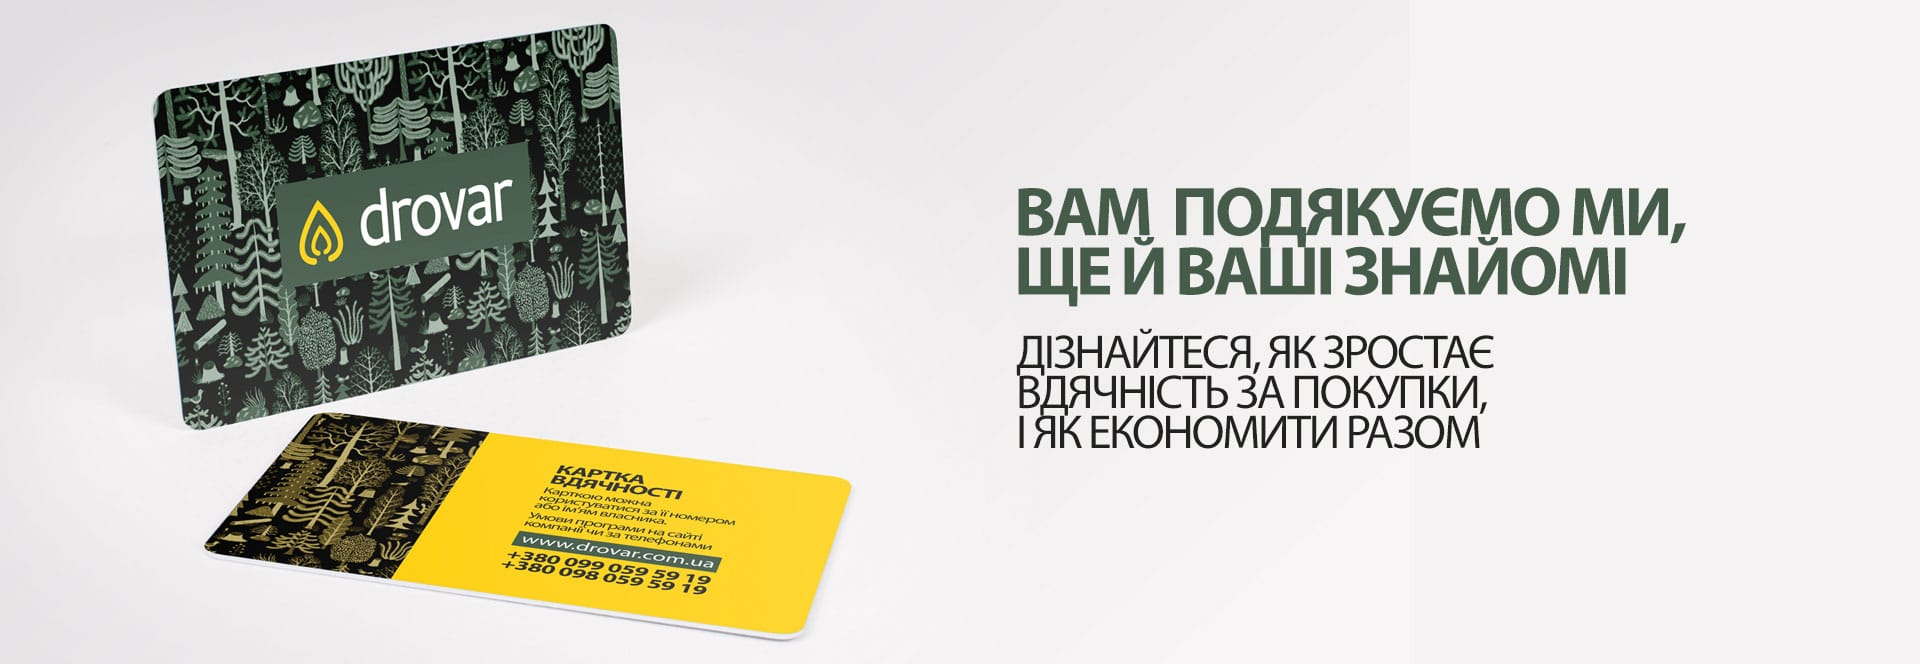 Card_banner_1920x664_High